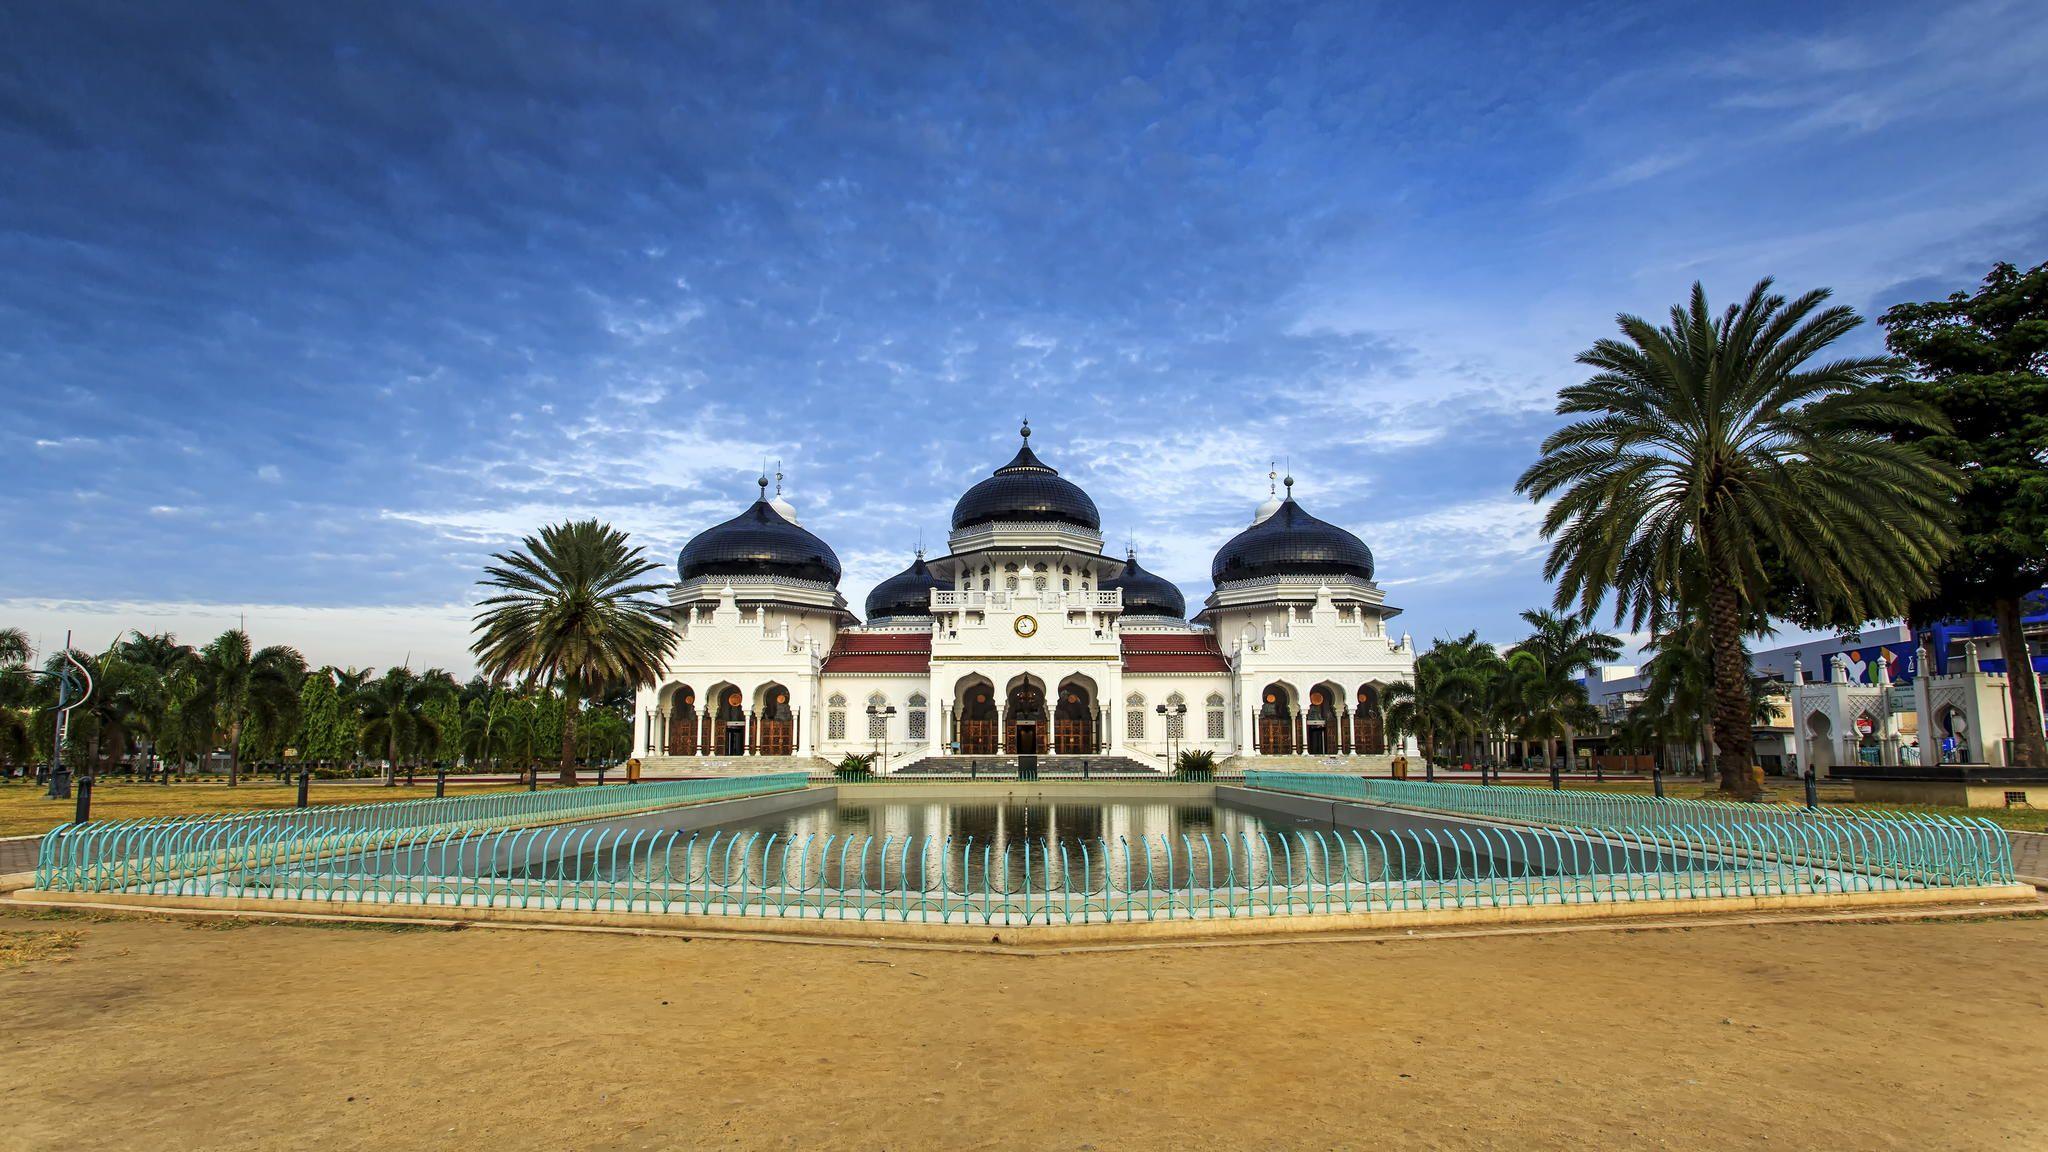 Baiturrahman by Muhammad Suhada on 500px Travel to